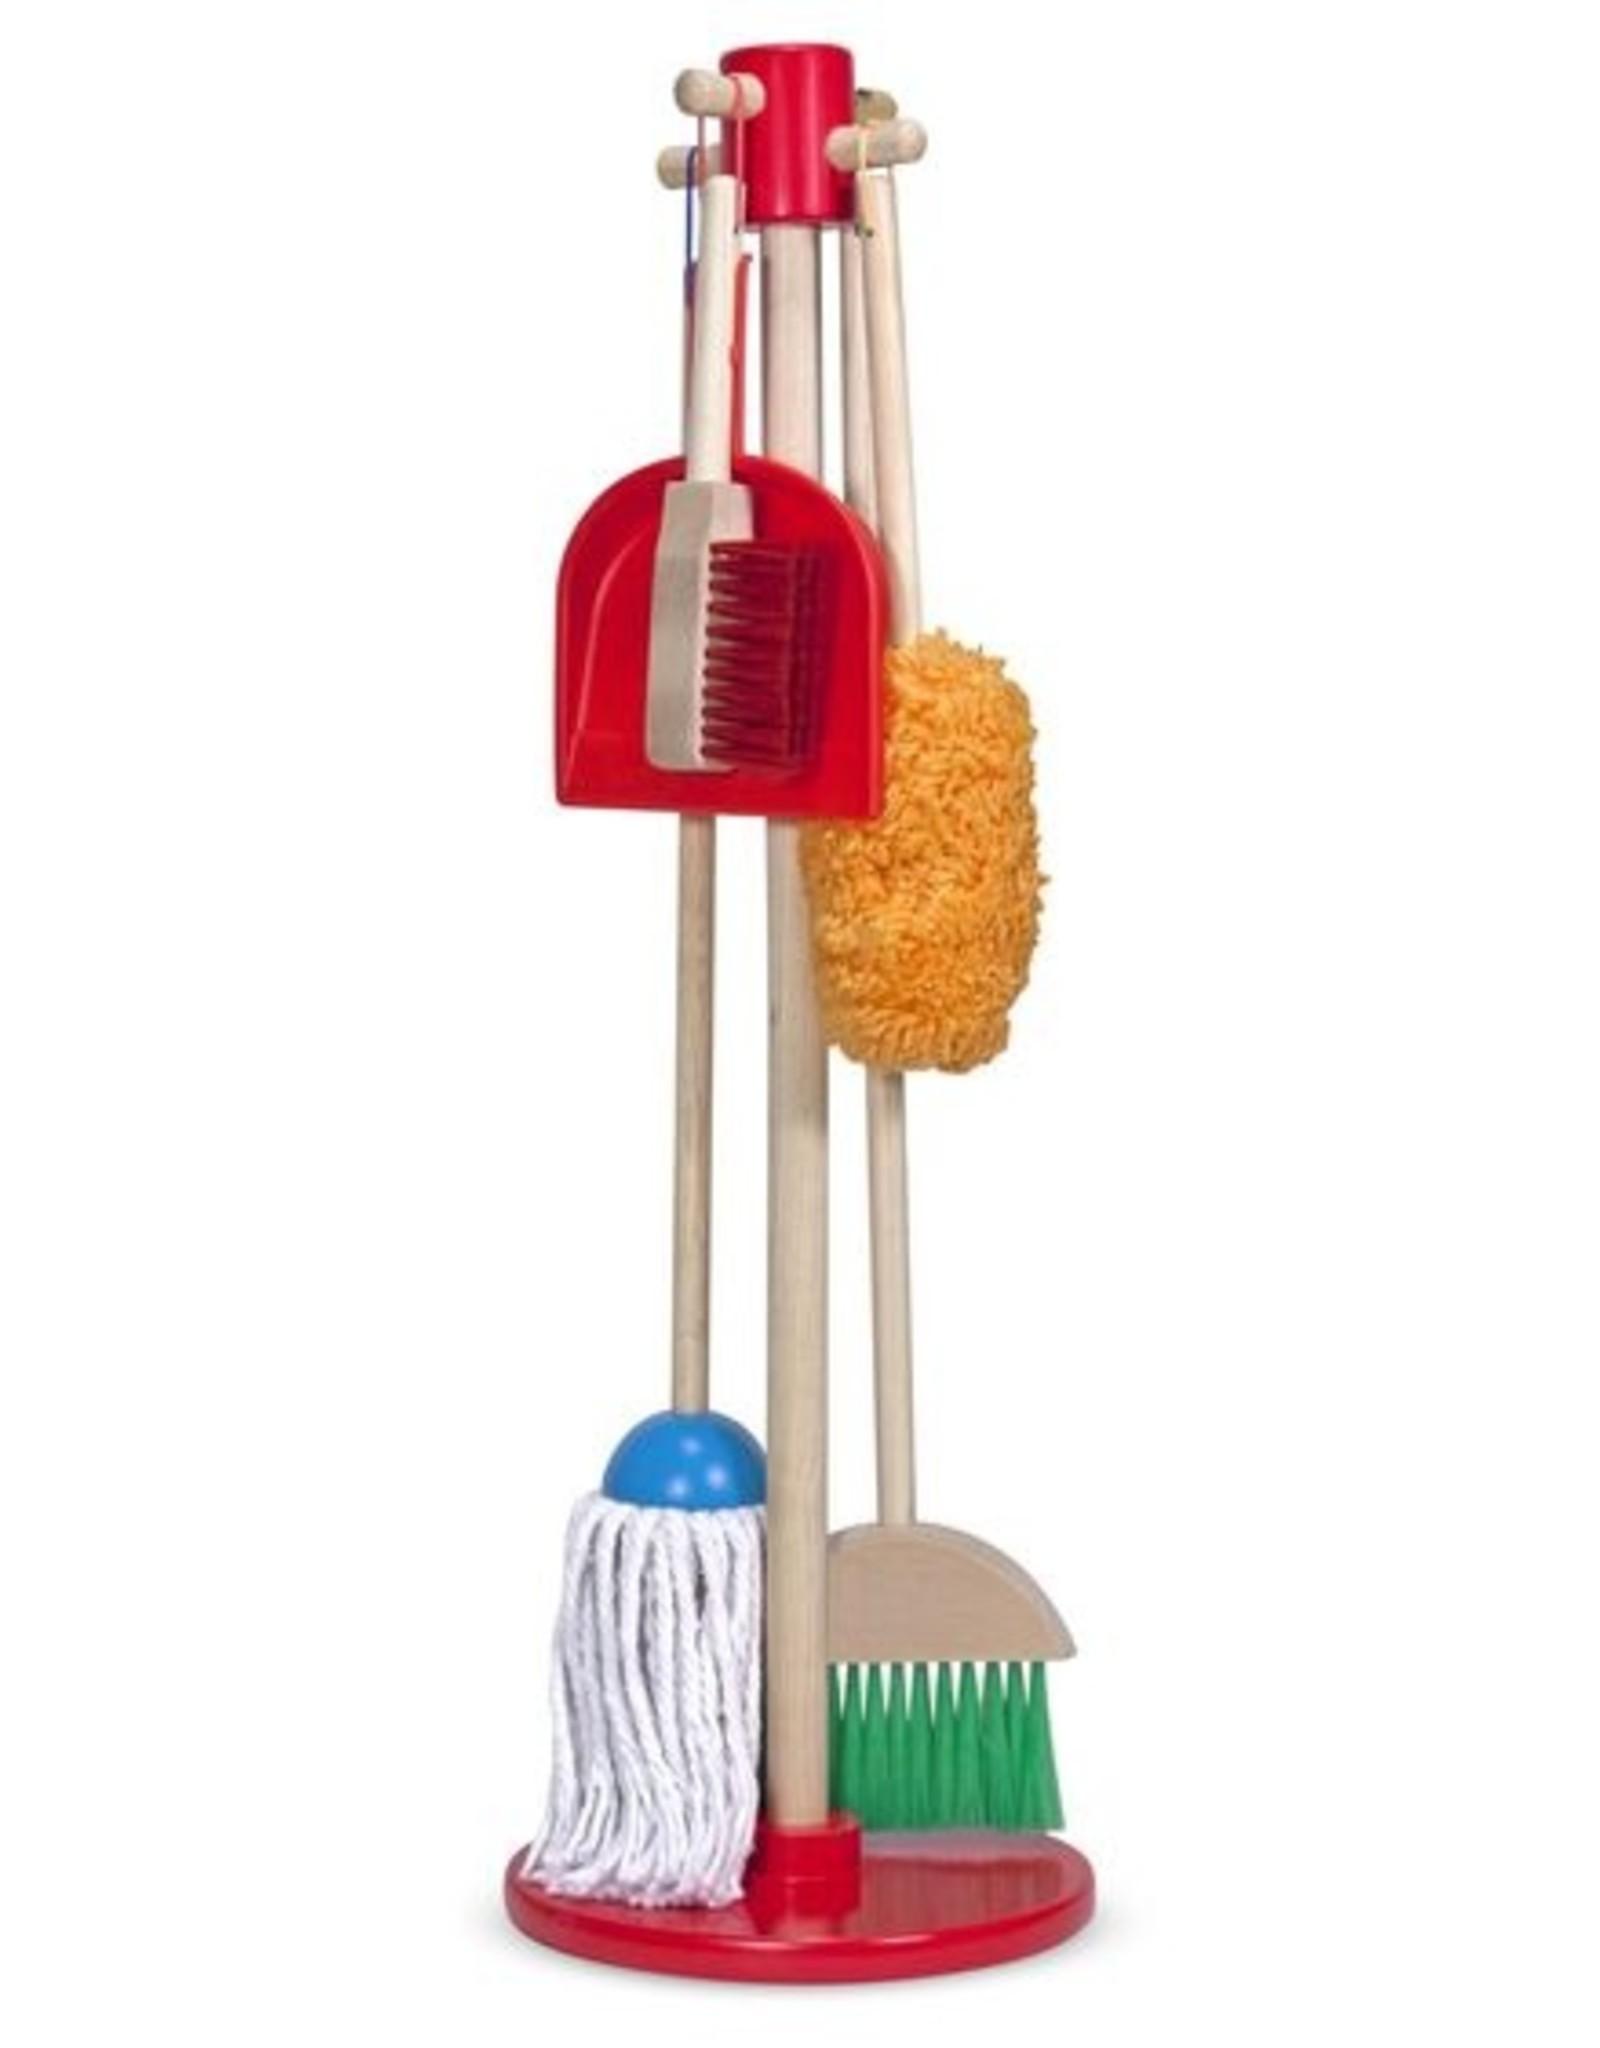 Dust Sweep Mop Play Set Family Fun Hobbies